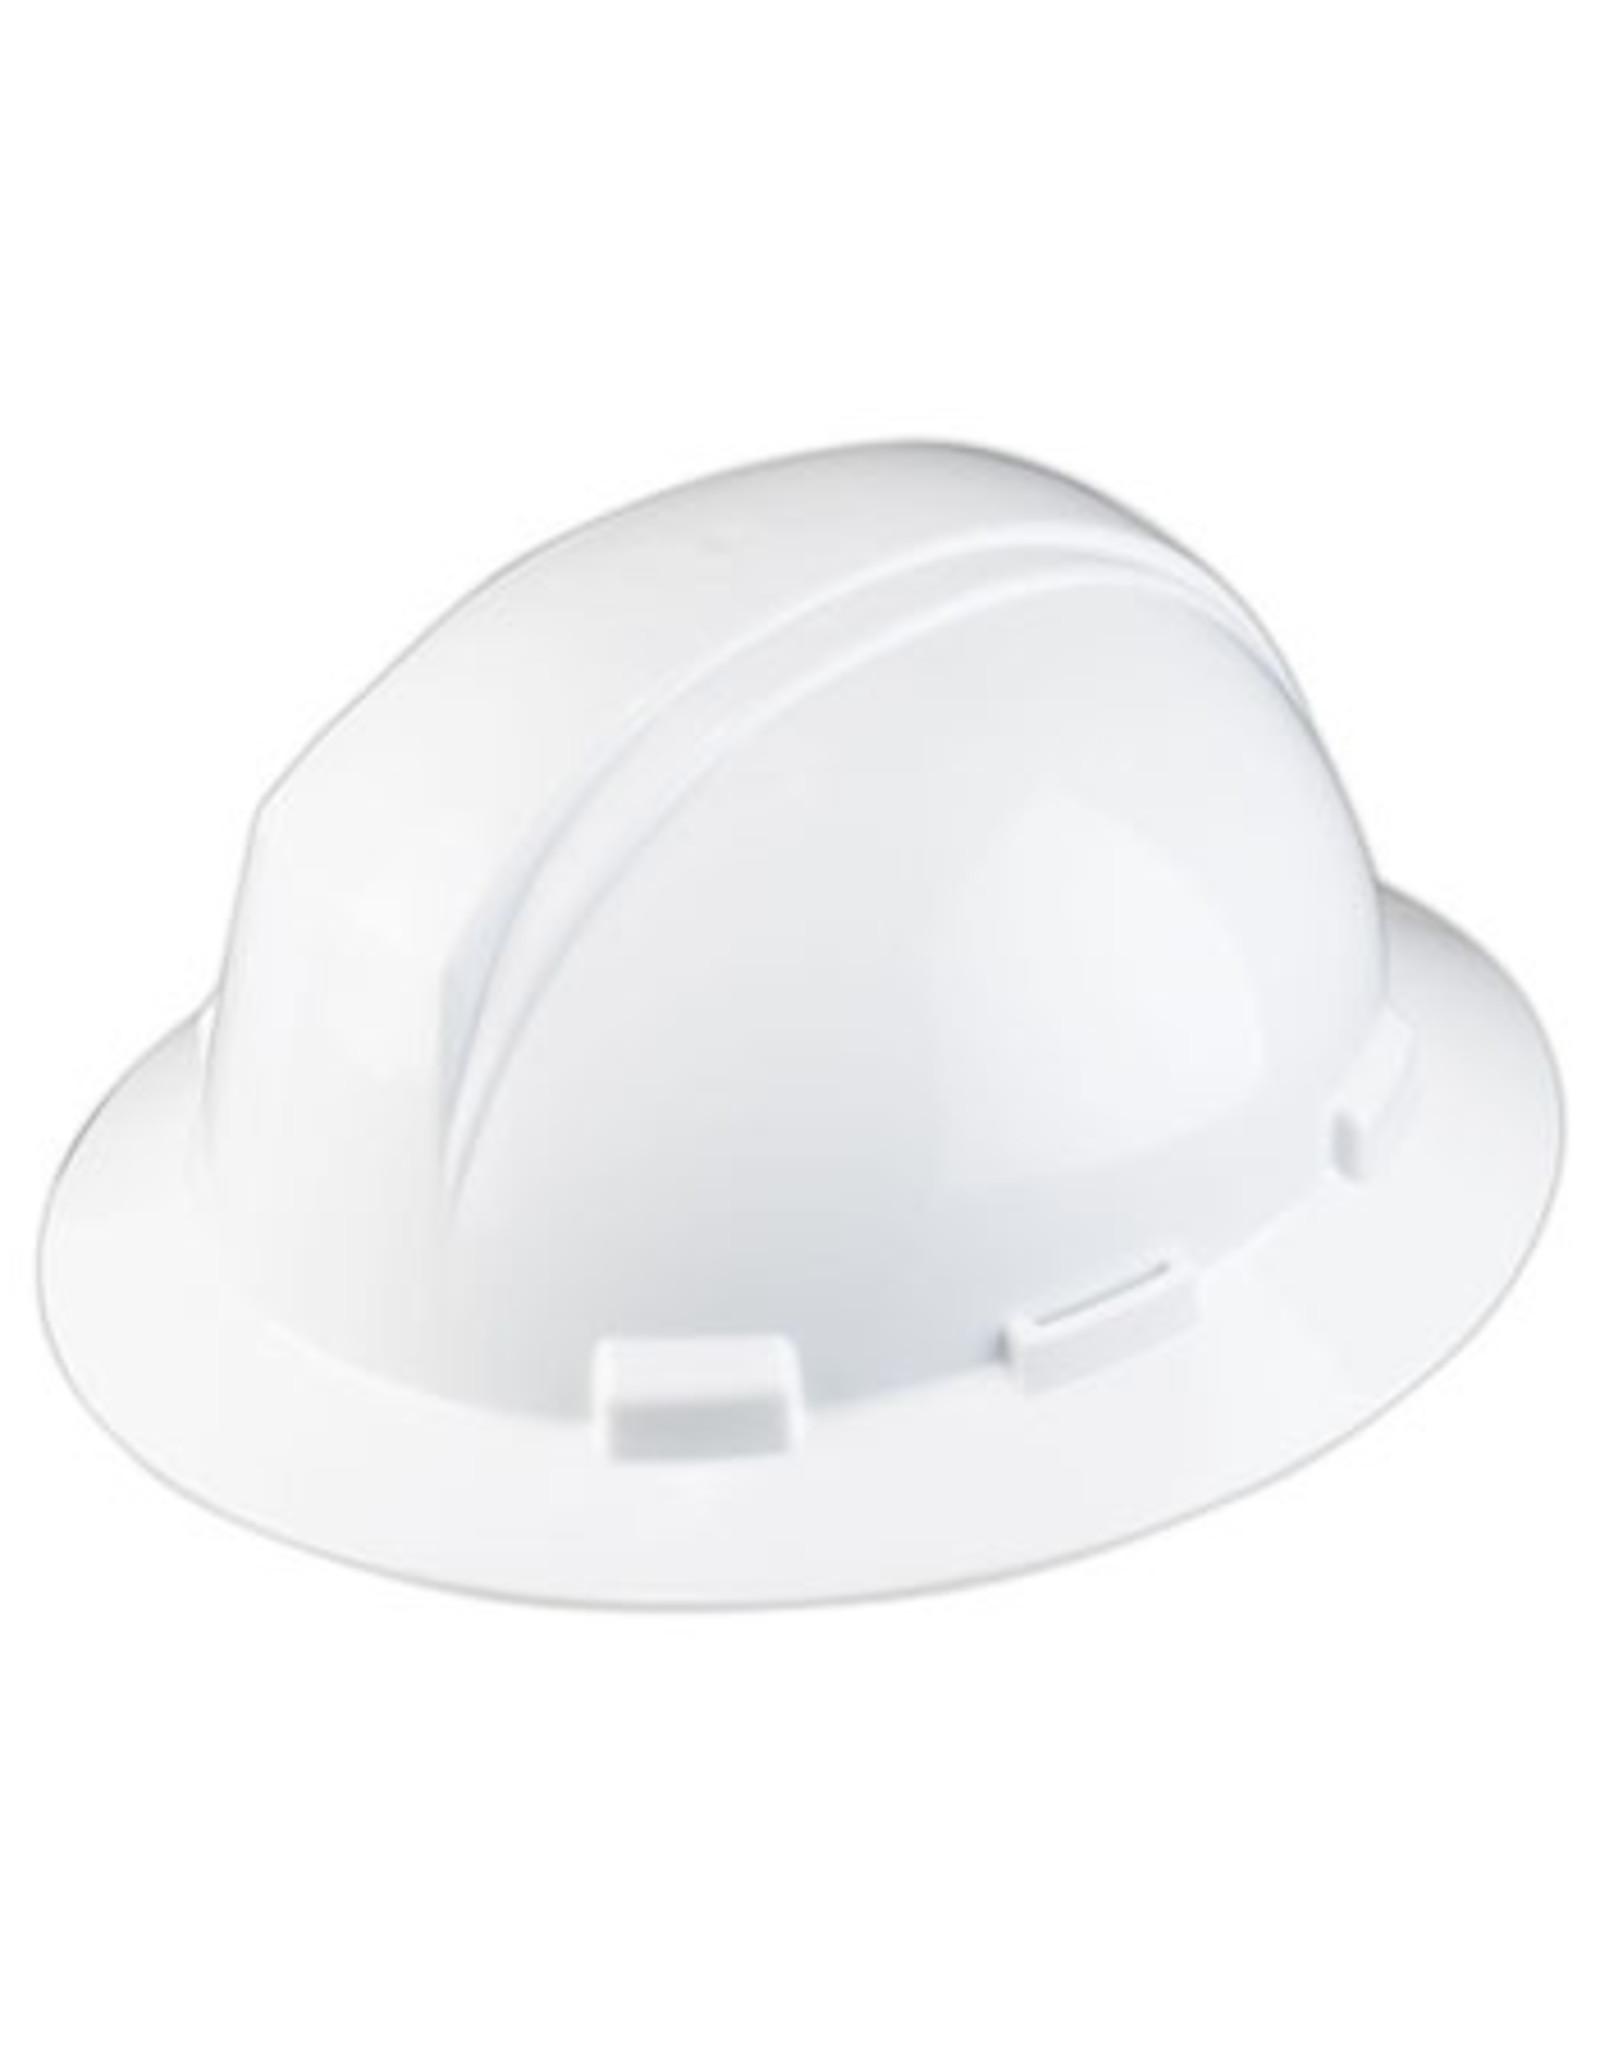 KILIMANJARO SAFETY HAT TYPE 1 - ''SURE-LOCK'' RATCHET